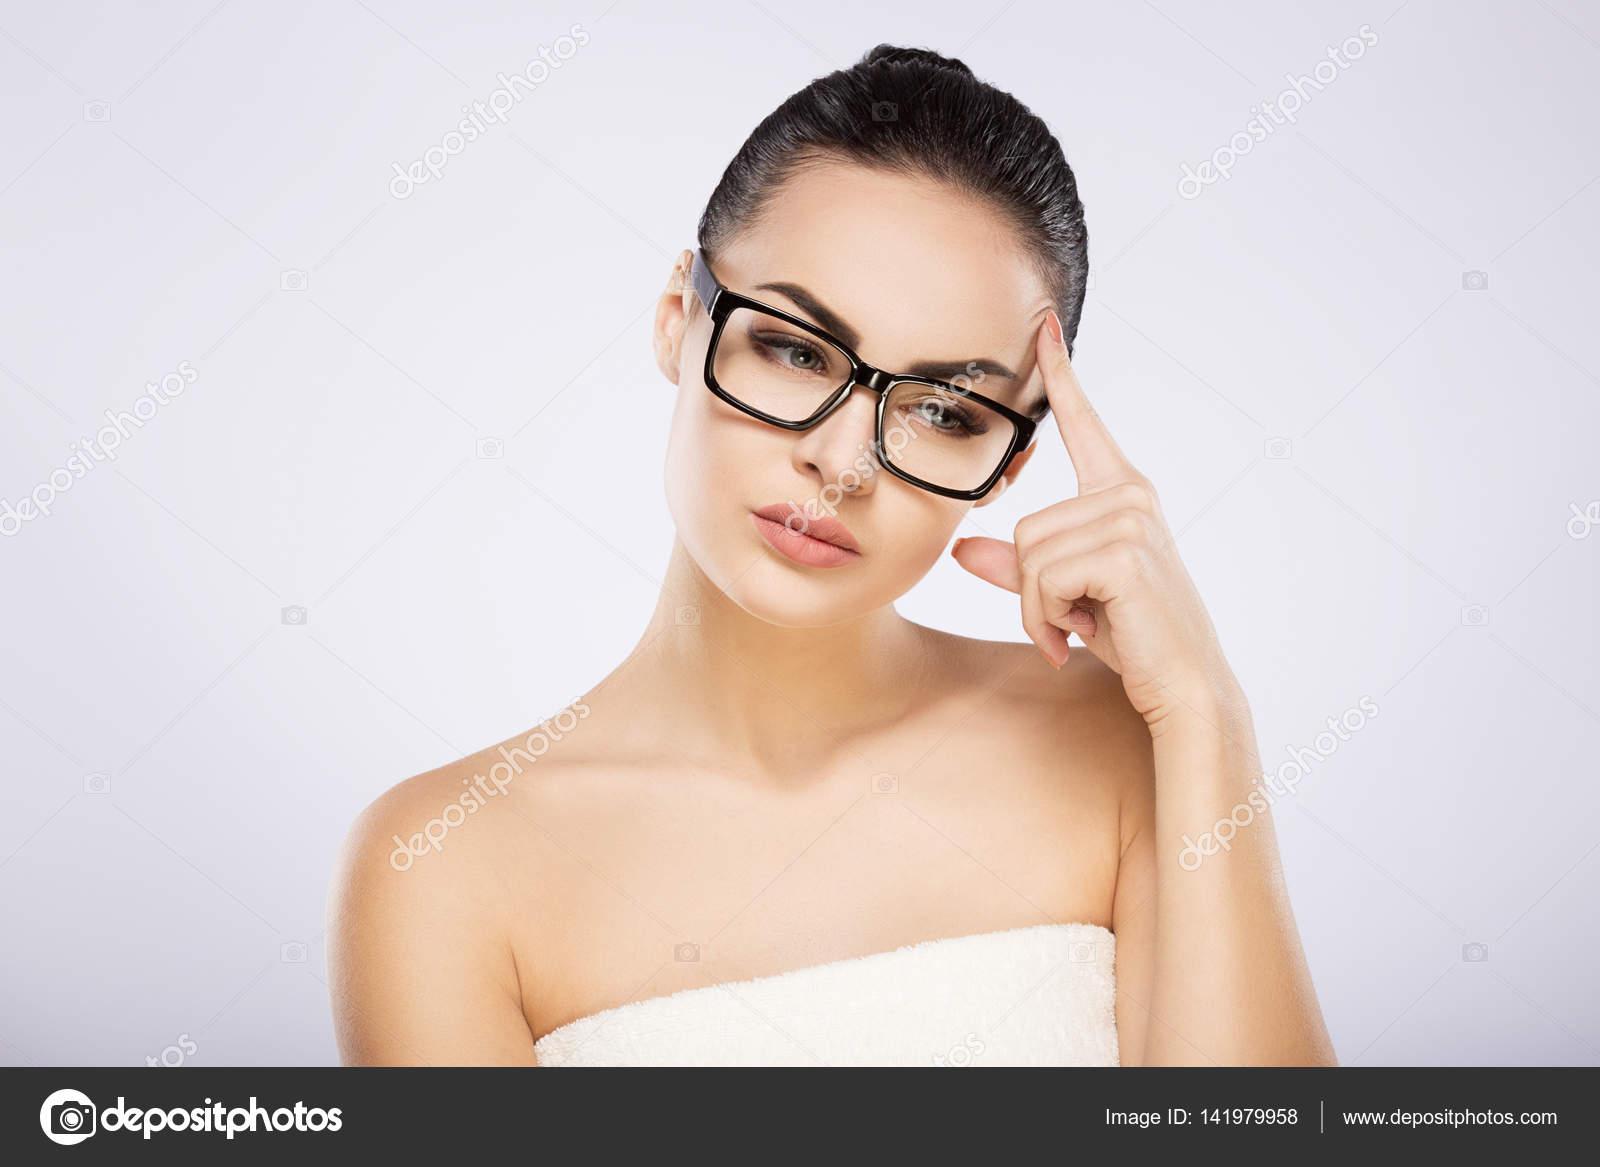 Your phrase nakna sexiga kvinnor med glasoegon pity, that